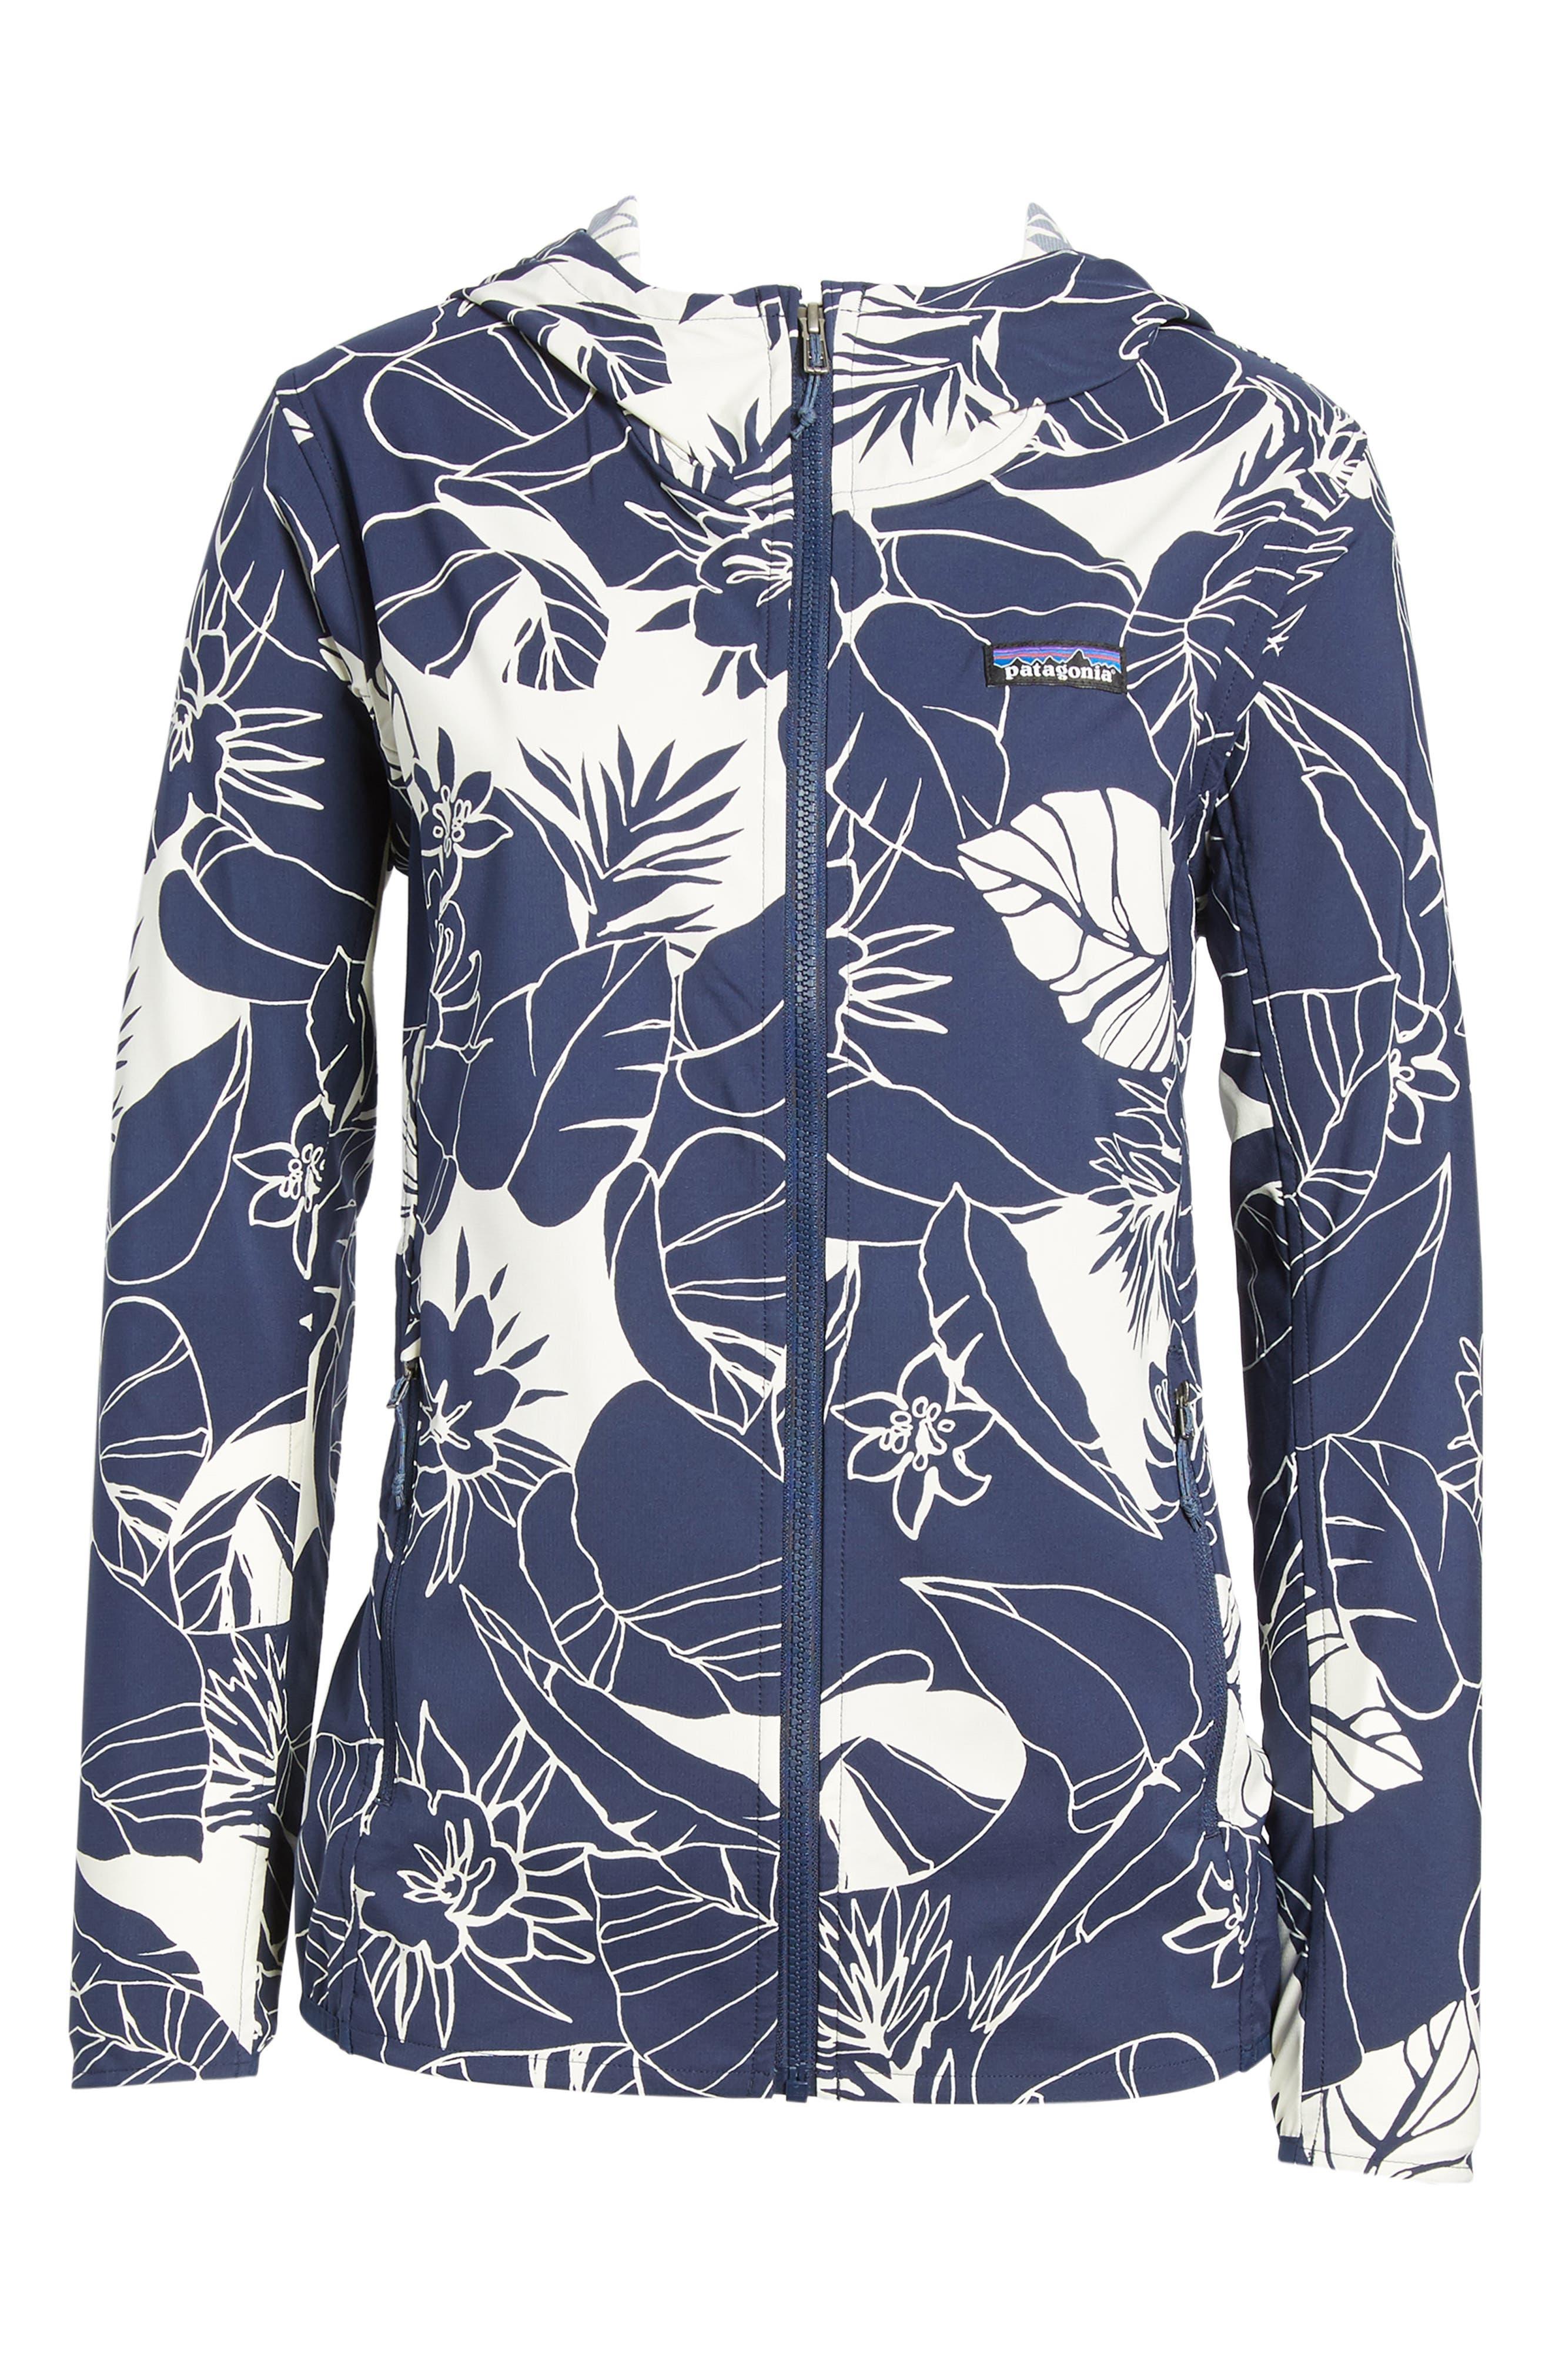 Bajadas Hoodie Jacket,                             Alternate thumbnail 7, color,                             Classic Navy/ Birch White